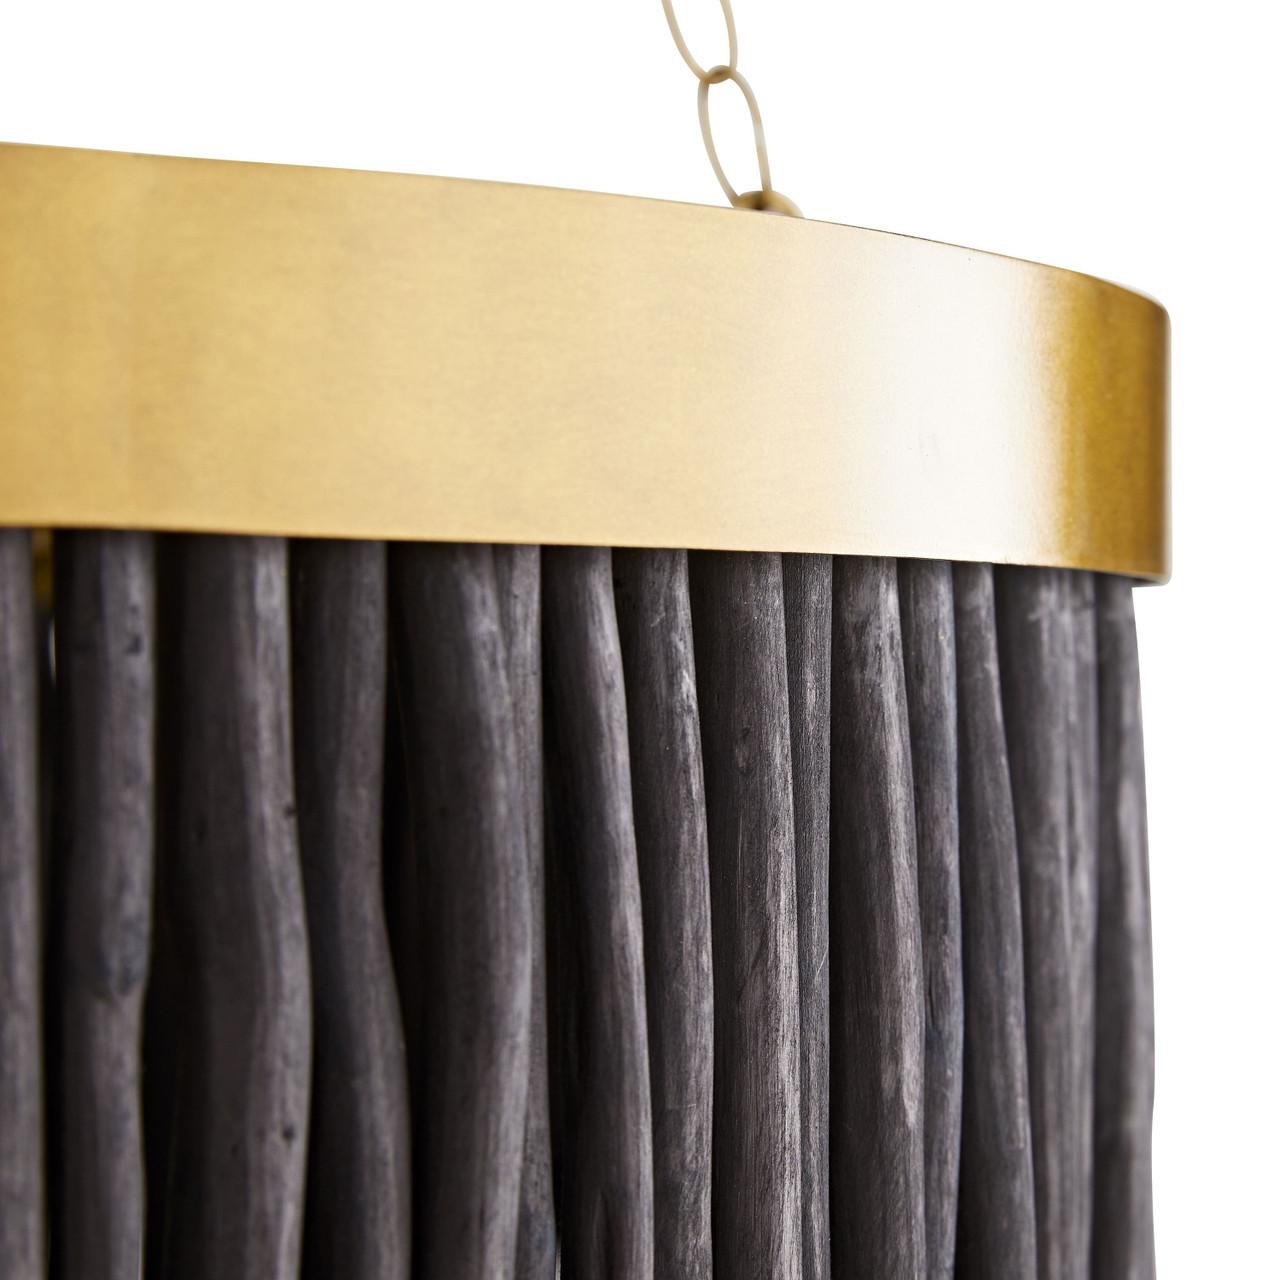 Rya Pendant Antique Brass Hand-carved Wood Batons